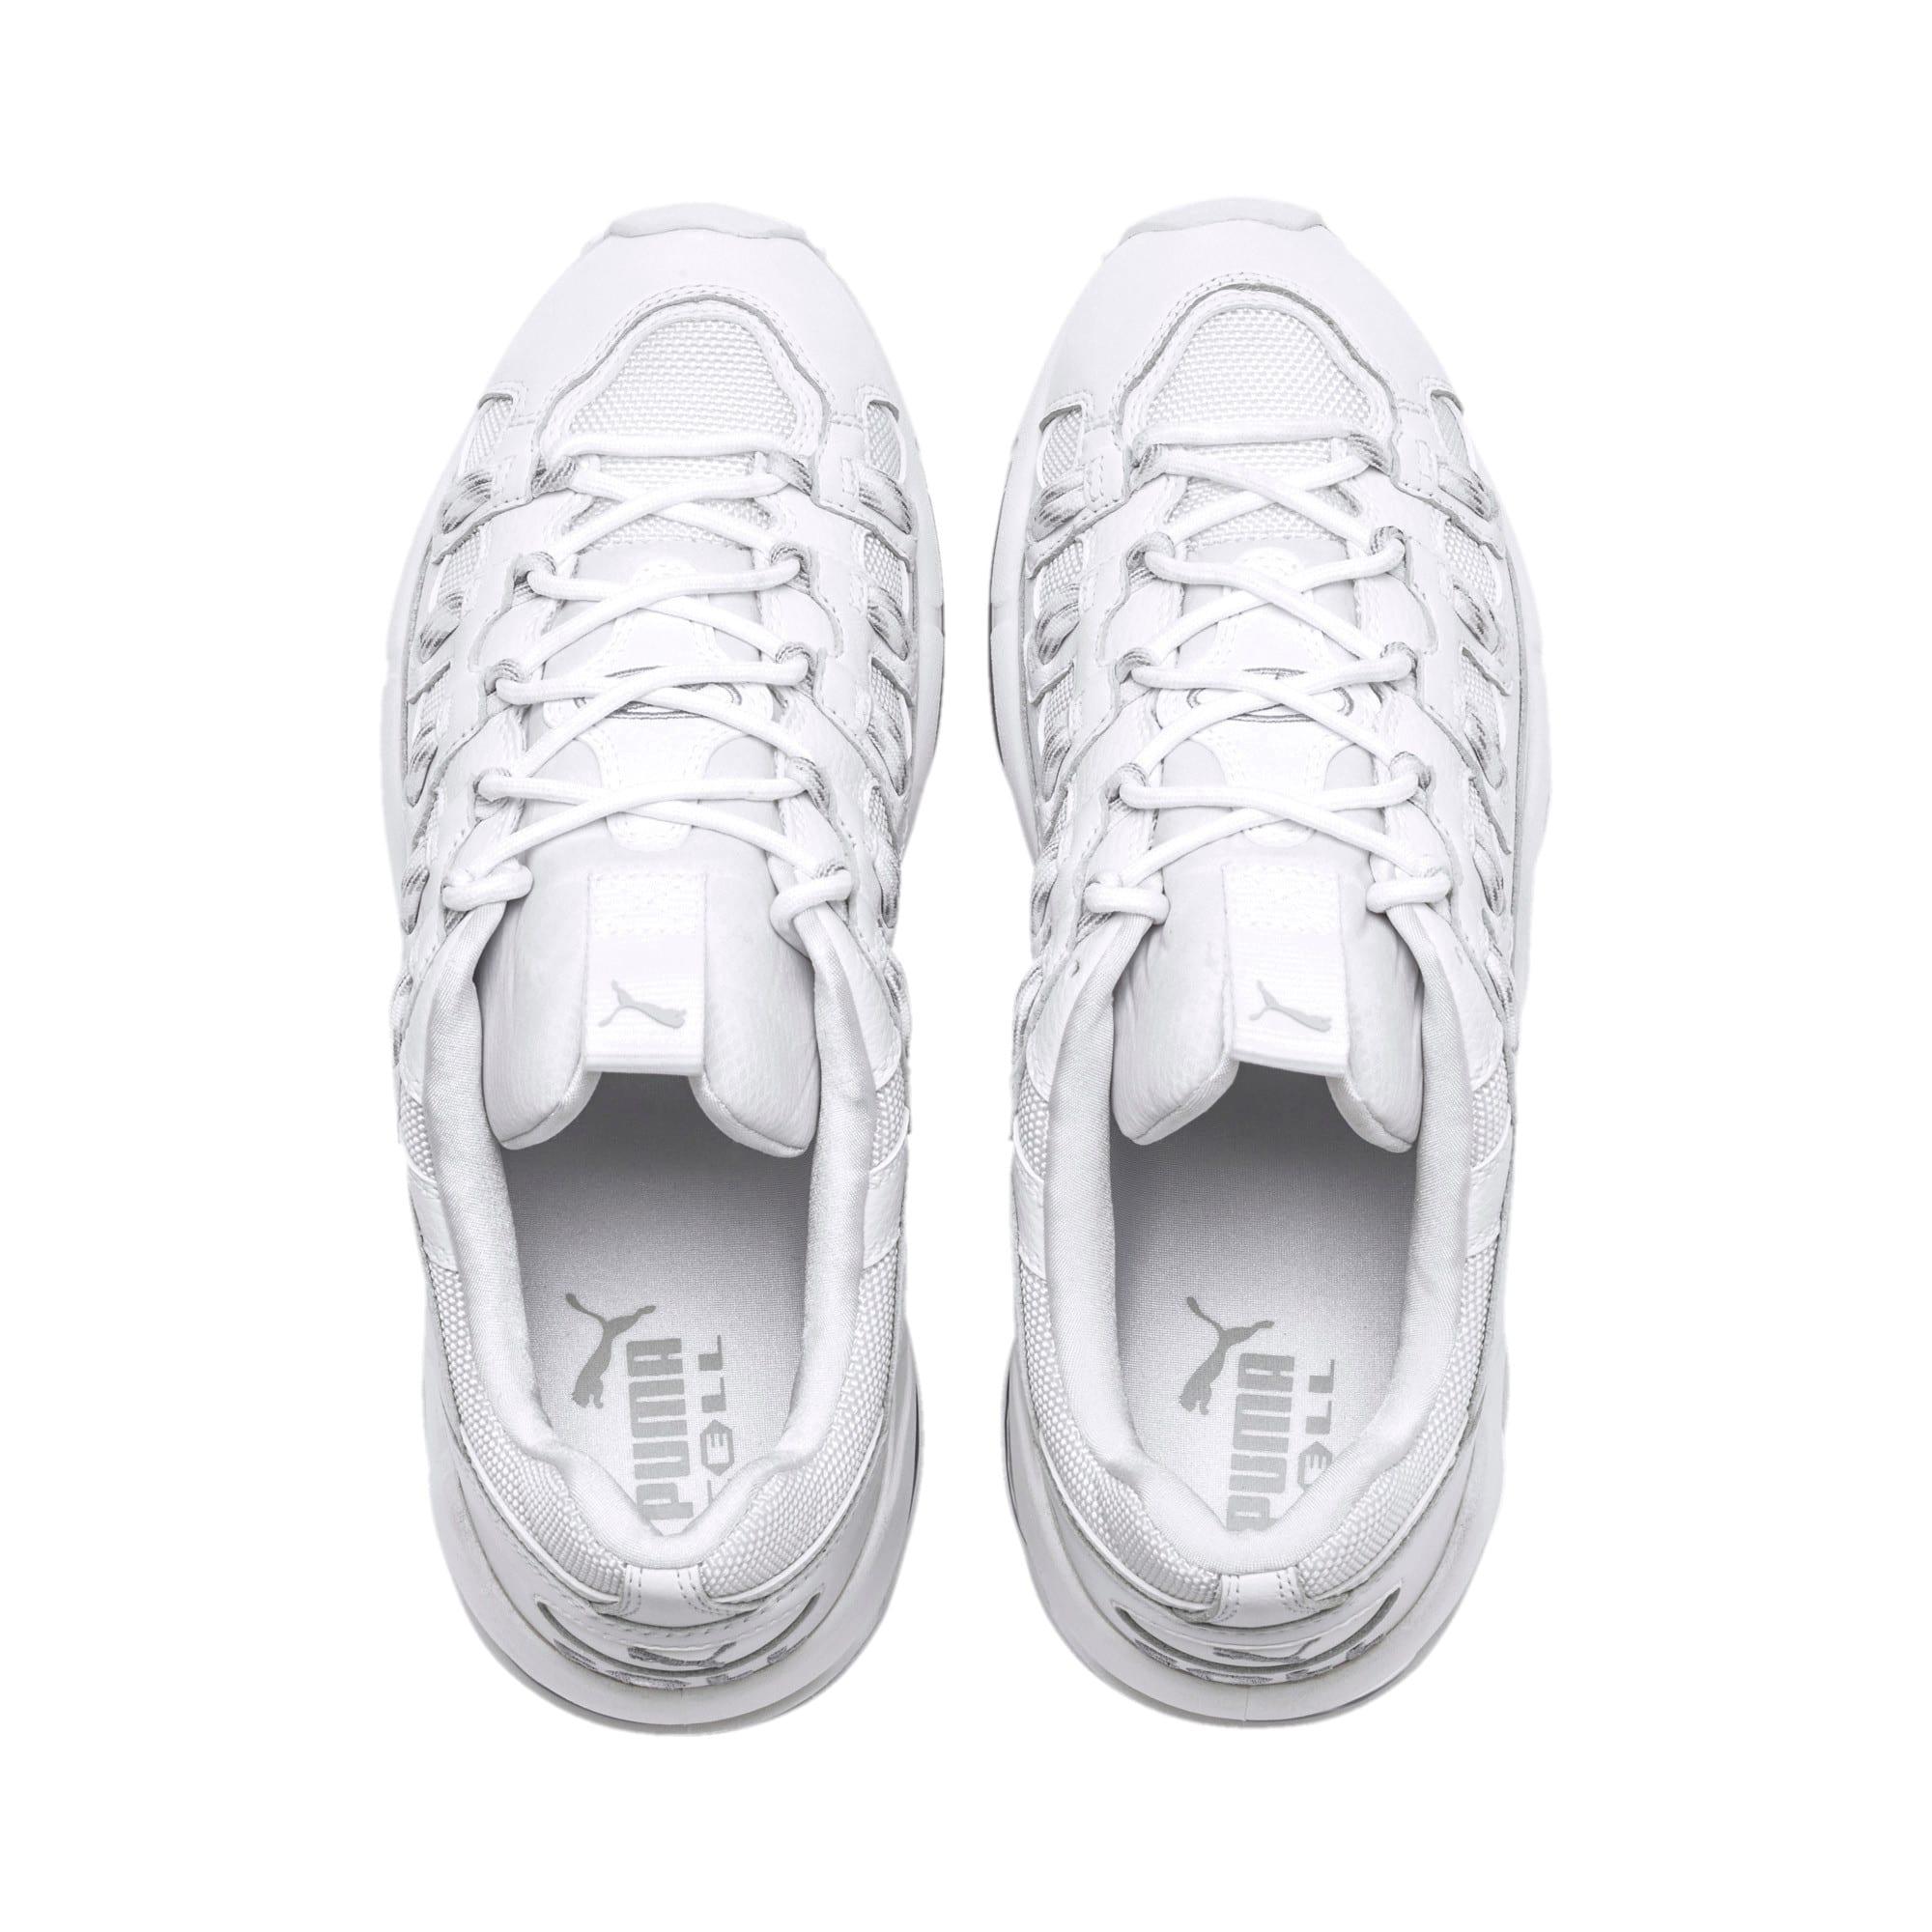 Thumbnail 7 of CELL Endura Rebound Sneaker, Puma White-Puma White, medium